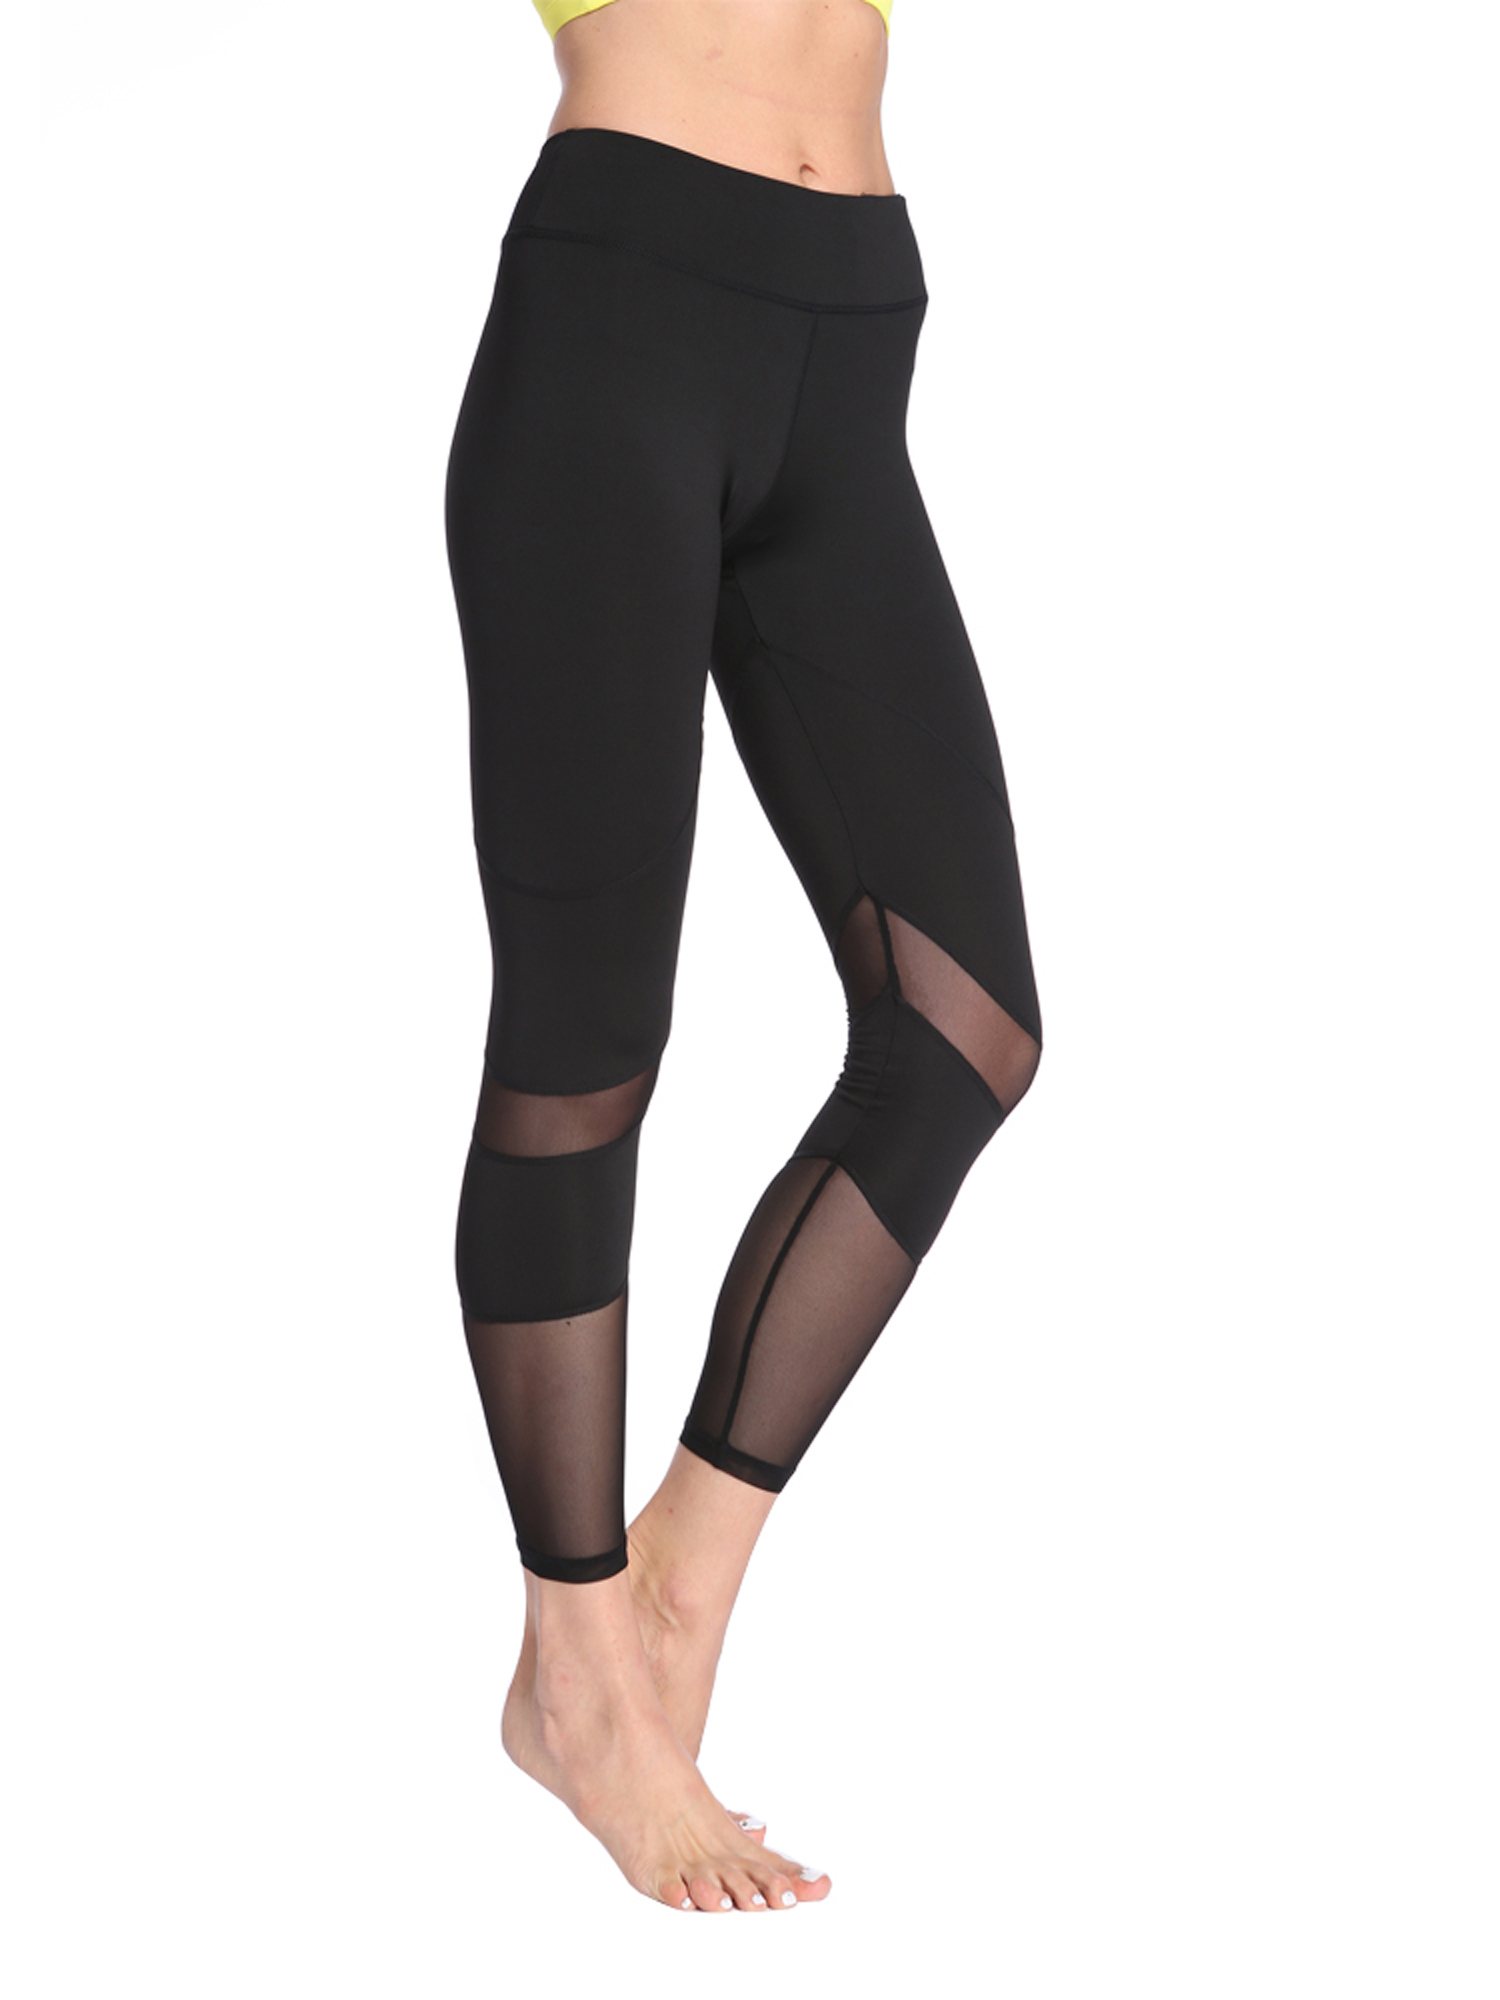 e4fbd708e1 OwnShoe - OwnShoe Women's Yoga Pants Mesh Stitching Athletic Running Tights  Leggings - Walmart.com